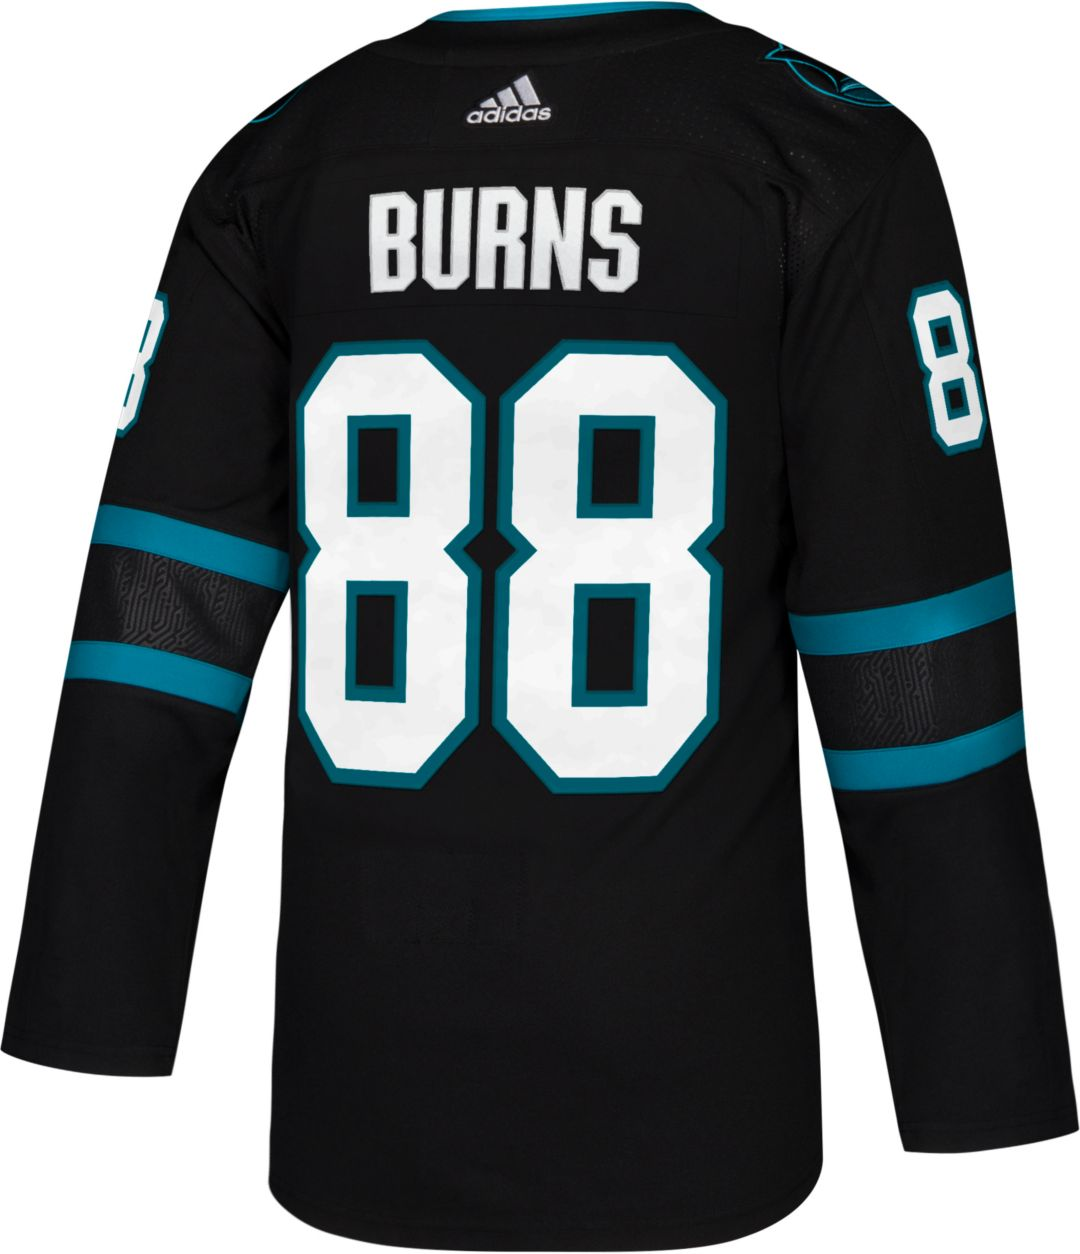 new style 4acb0 95ecb adidas Men's San Jose Sharks Brent Burns #88 Authentic Pro Alternate Jersey